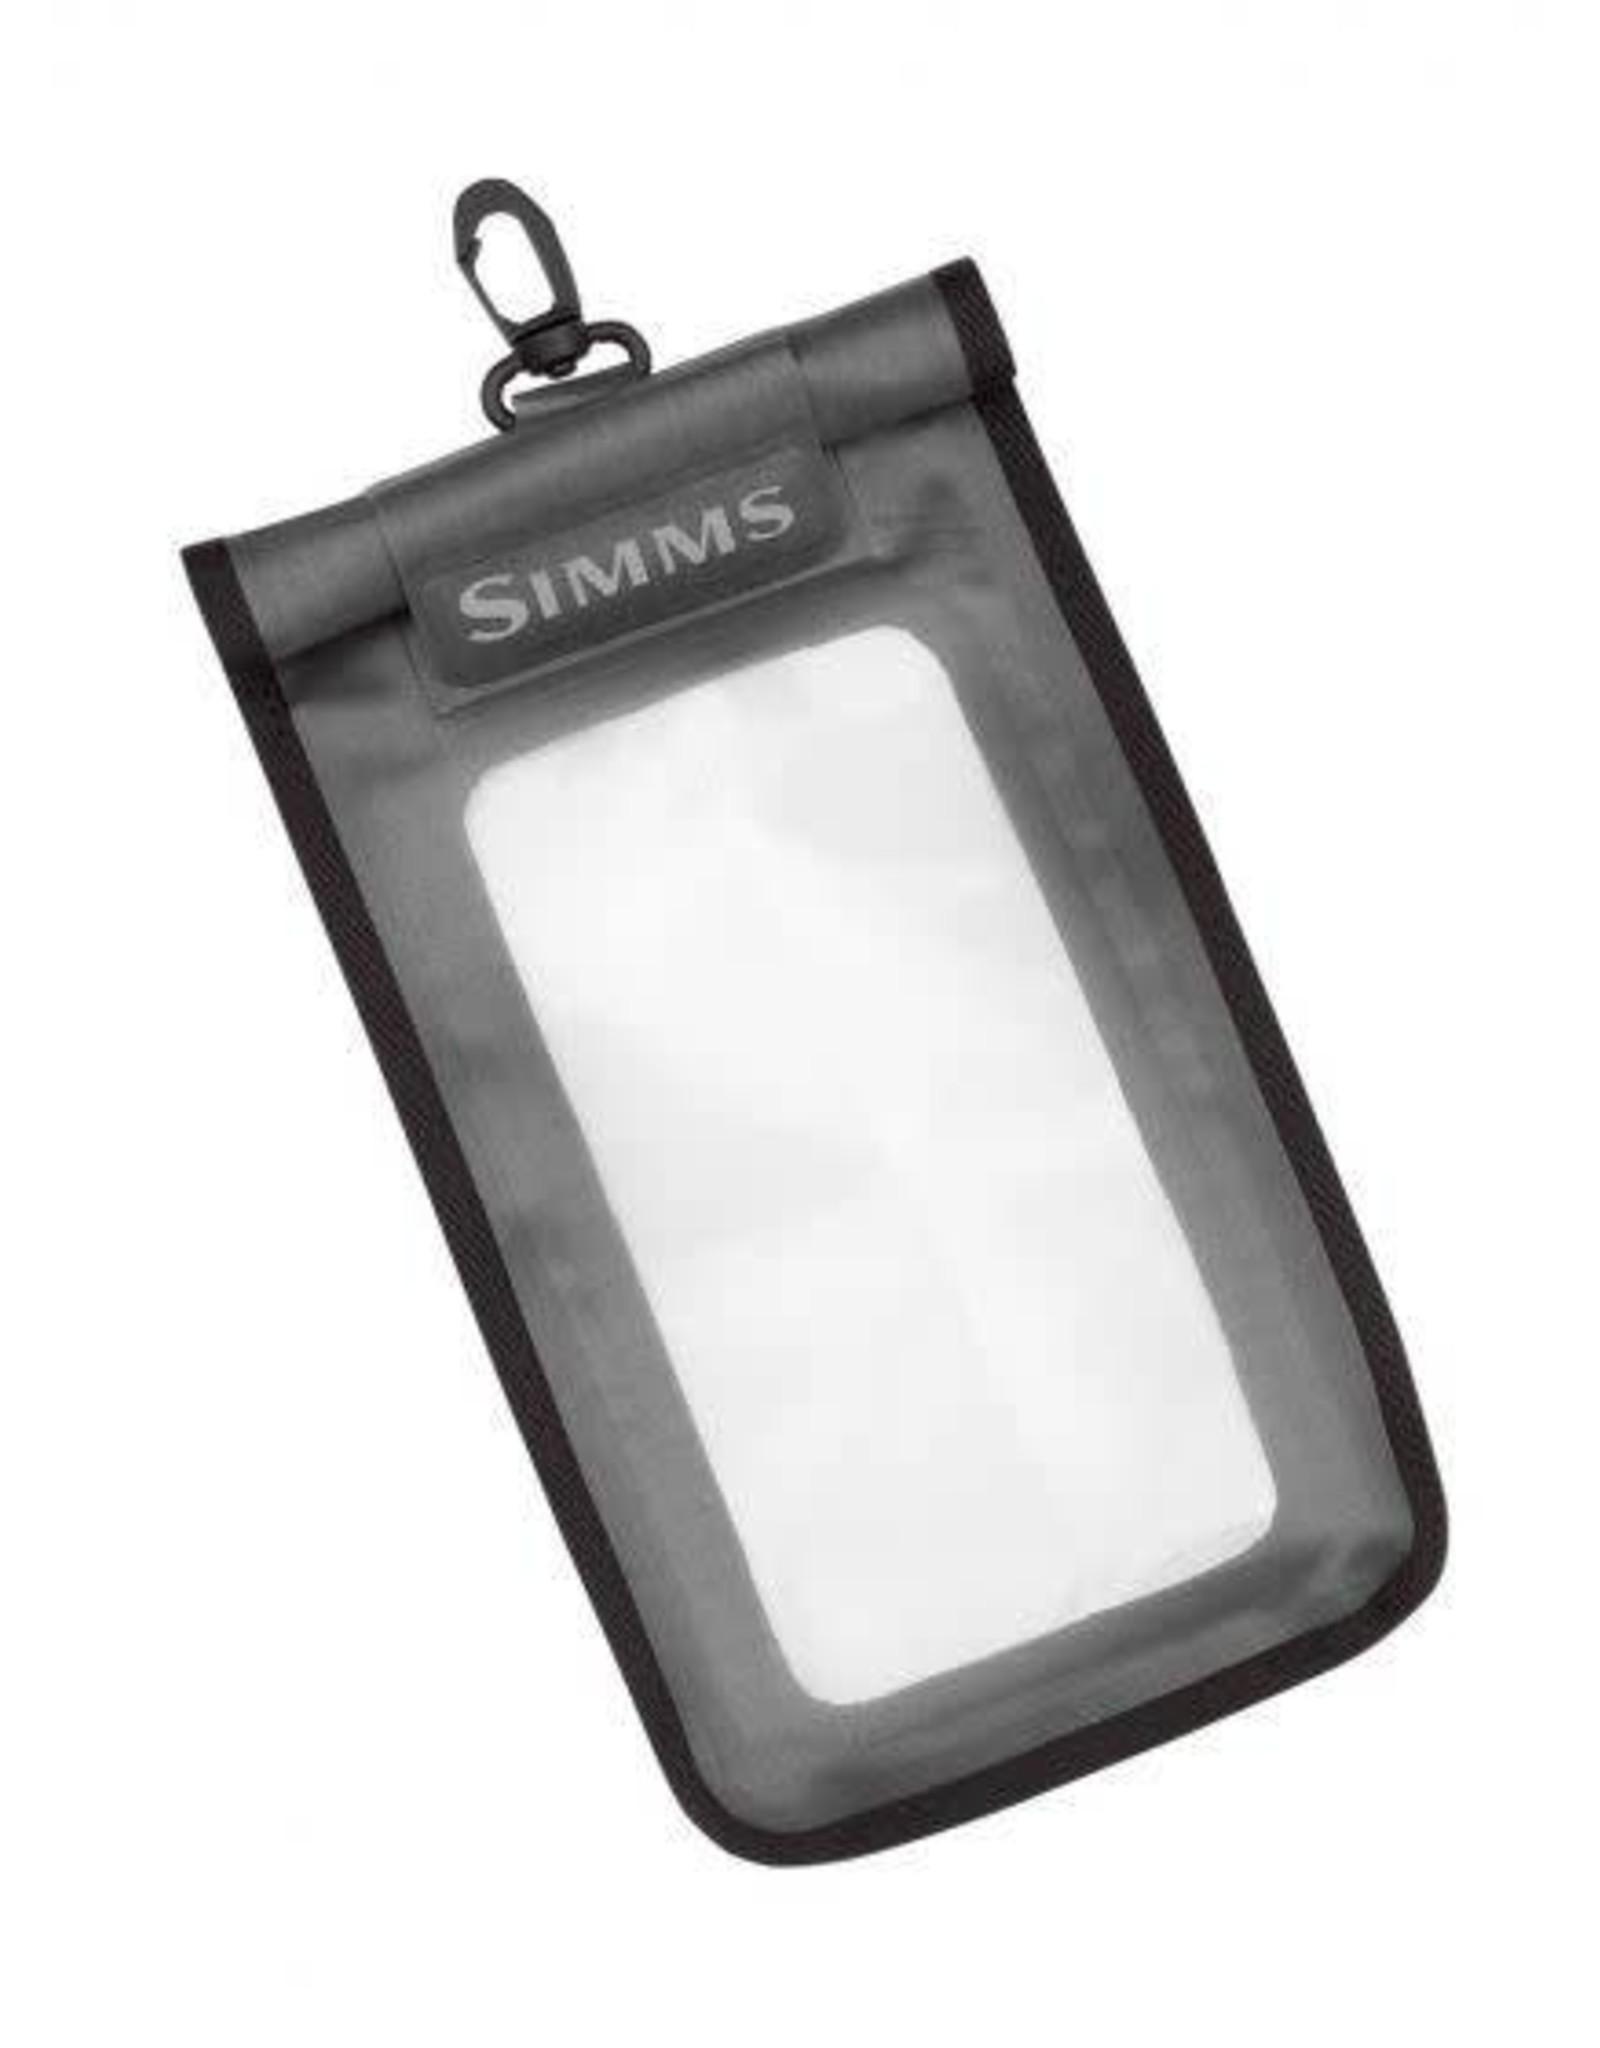 Simms Simms WaterProof Tech Pouch - Gunmental - Large